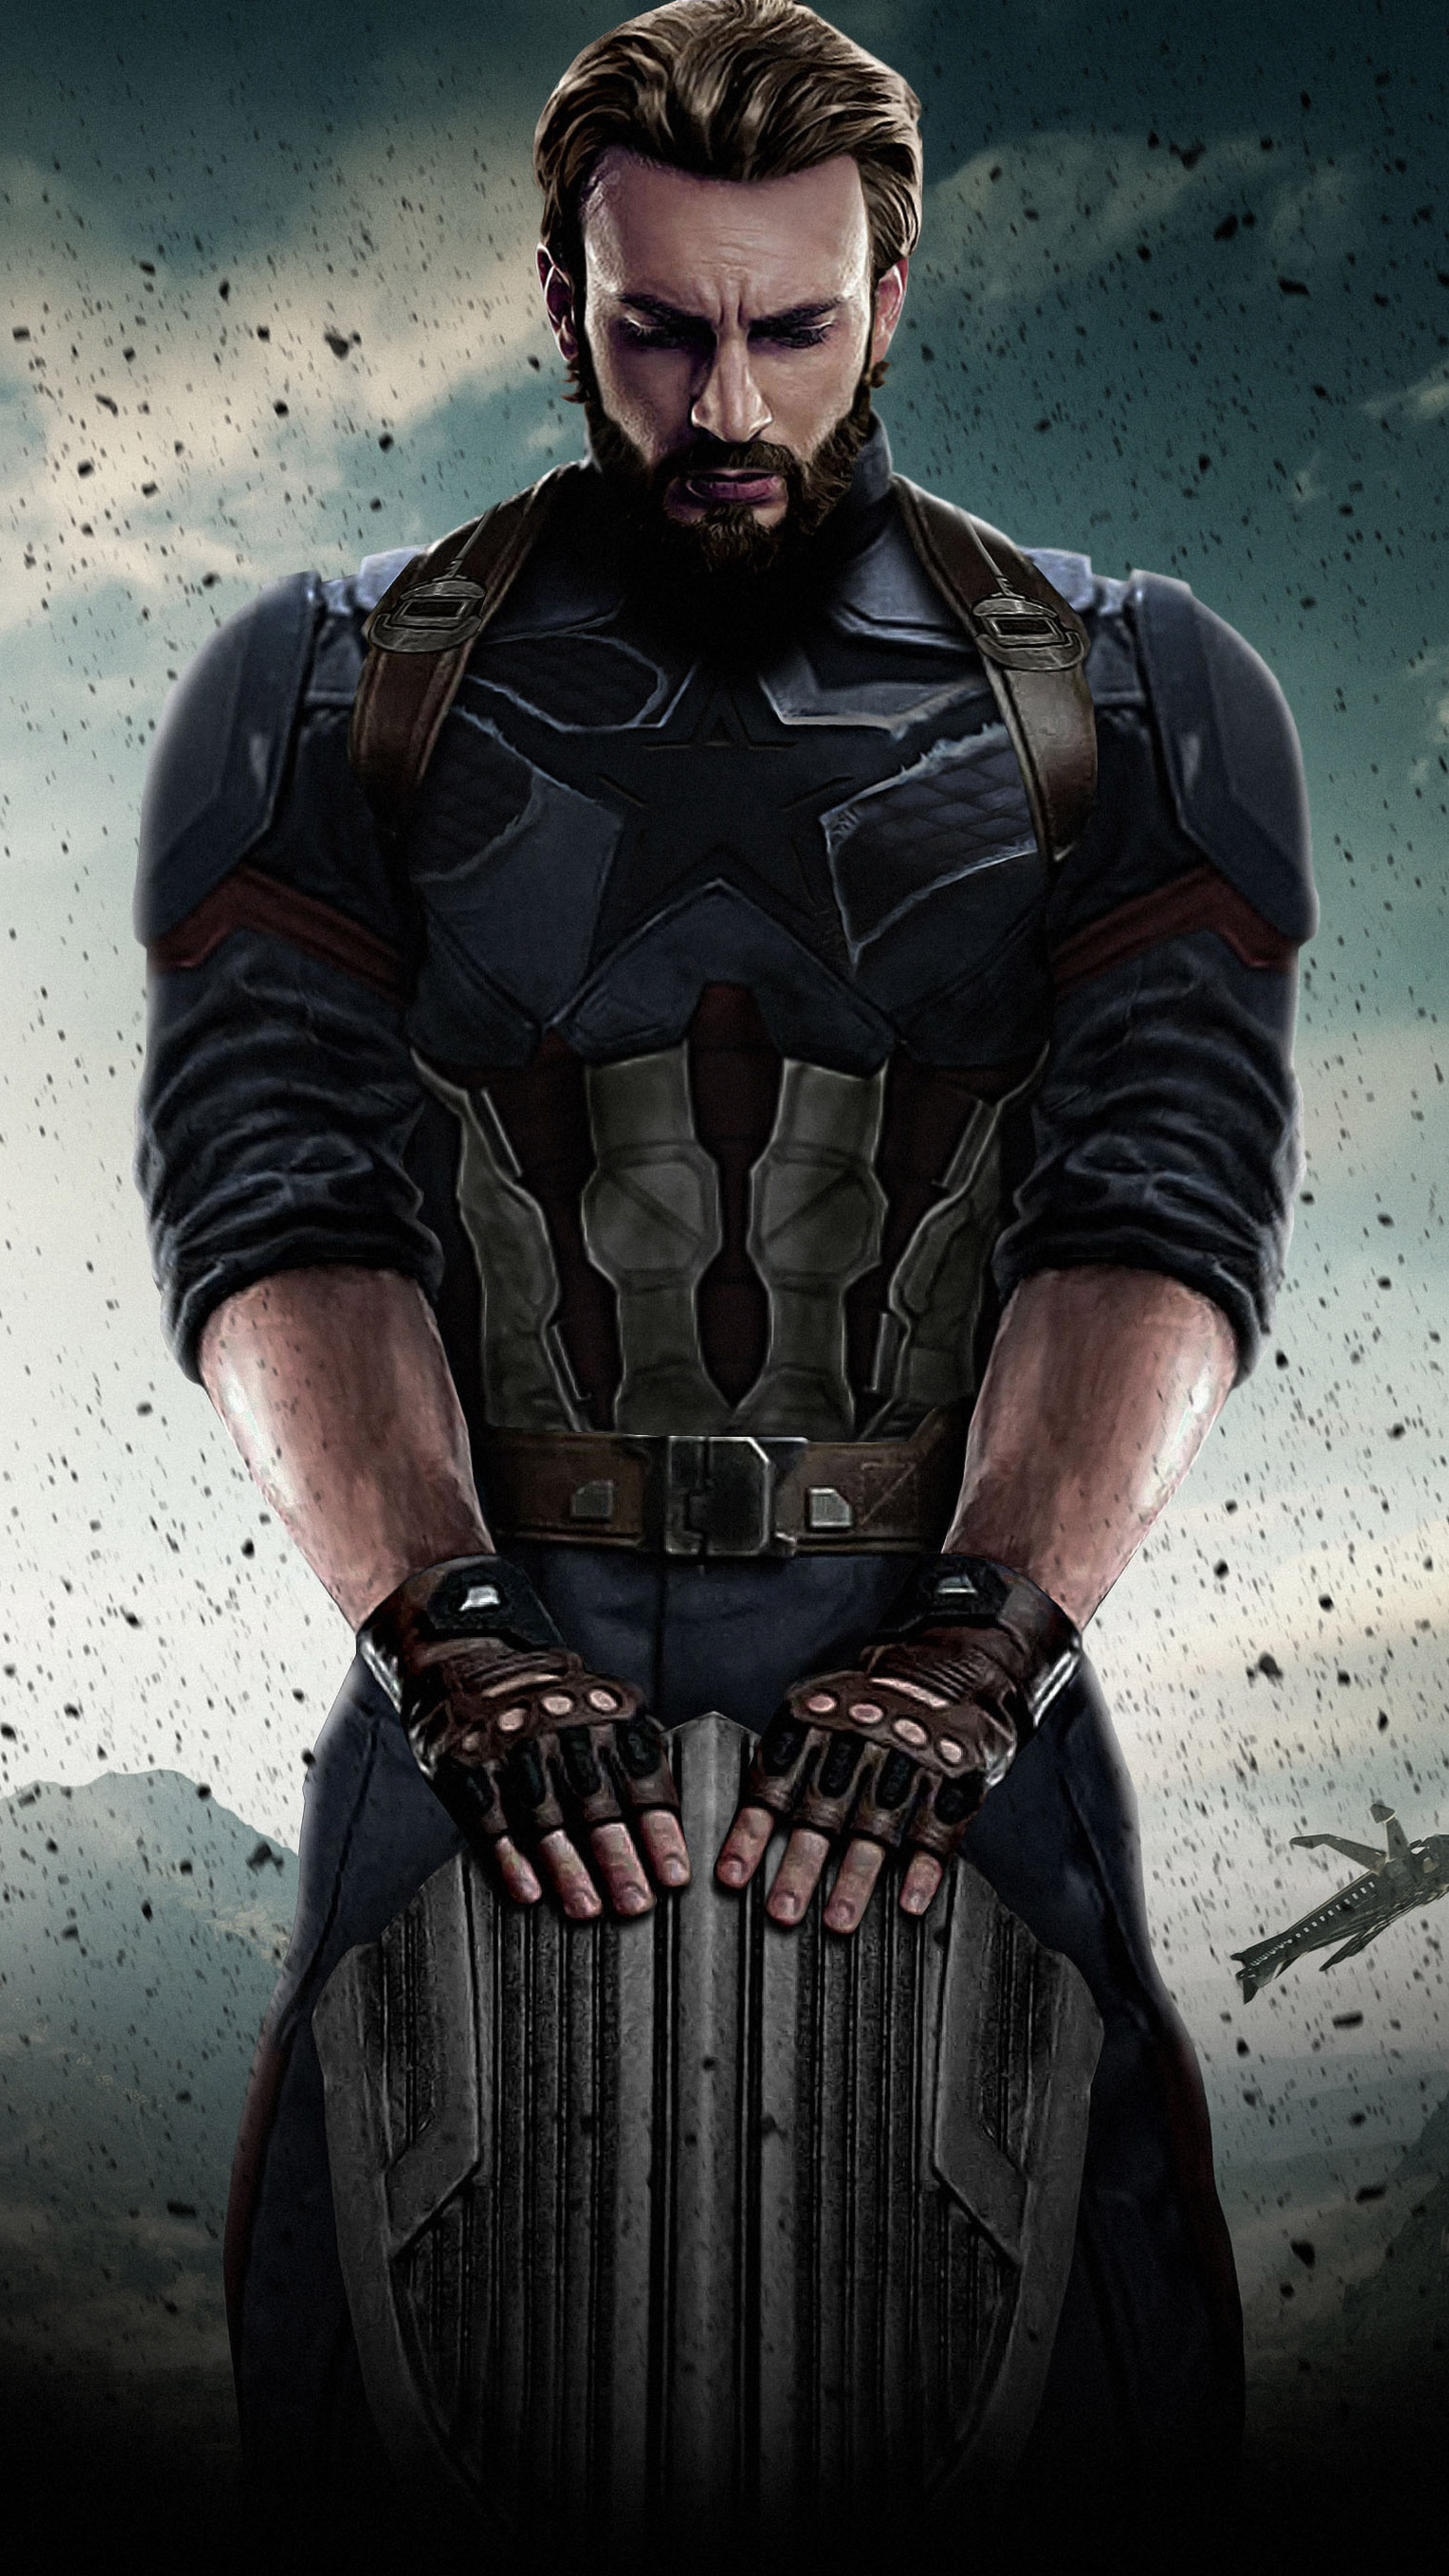 2160x3840 Captain America Avengers Infinity War 2018 Sony